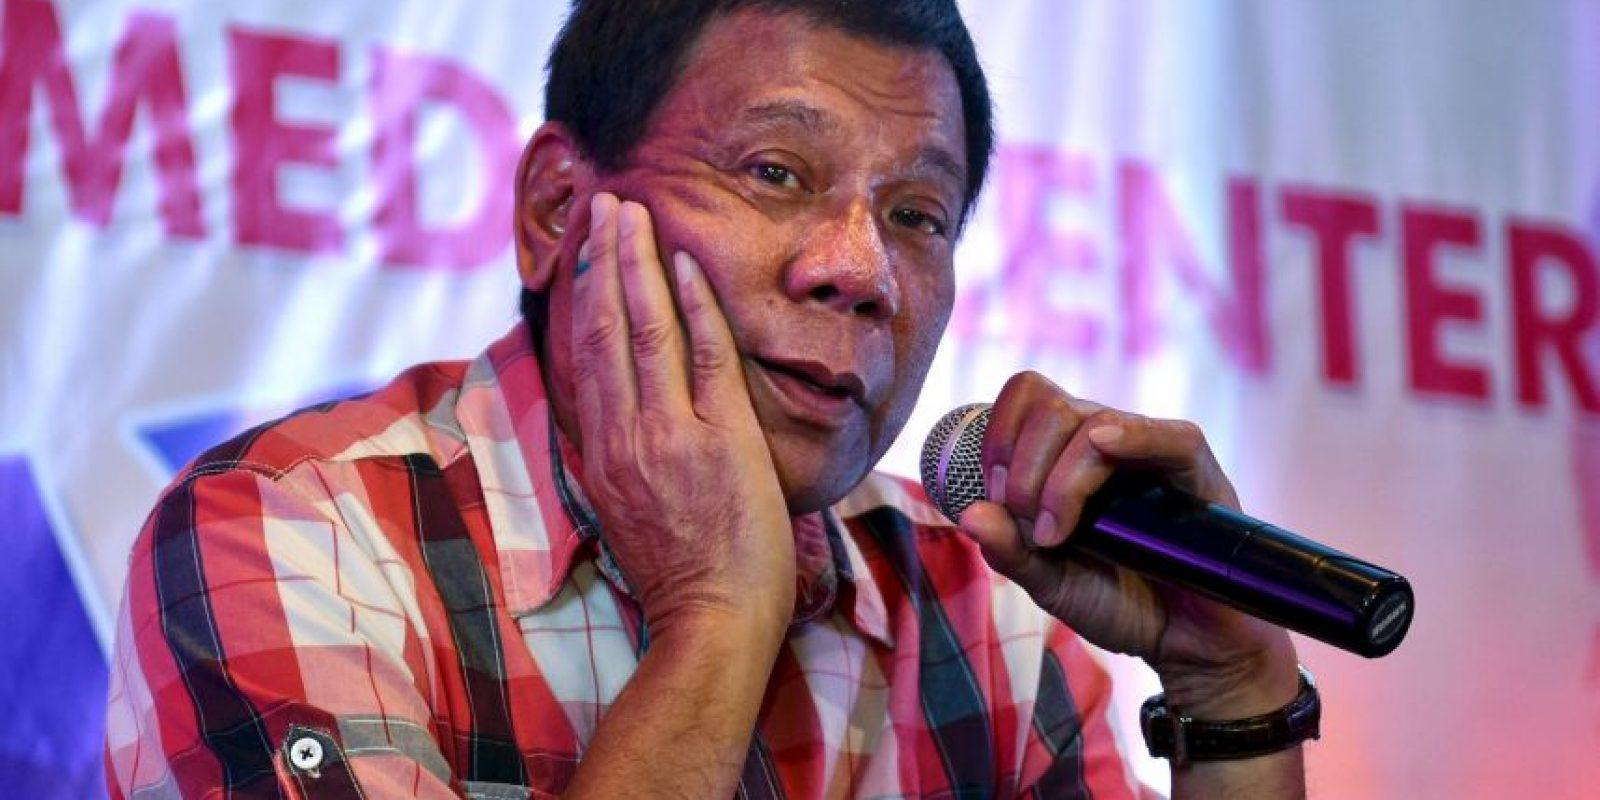 Rodrigo Duterte, presidente de Filipinas, es conocido por su fuerte lenguaje Foto:Getty Images